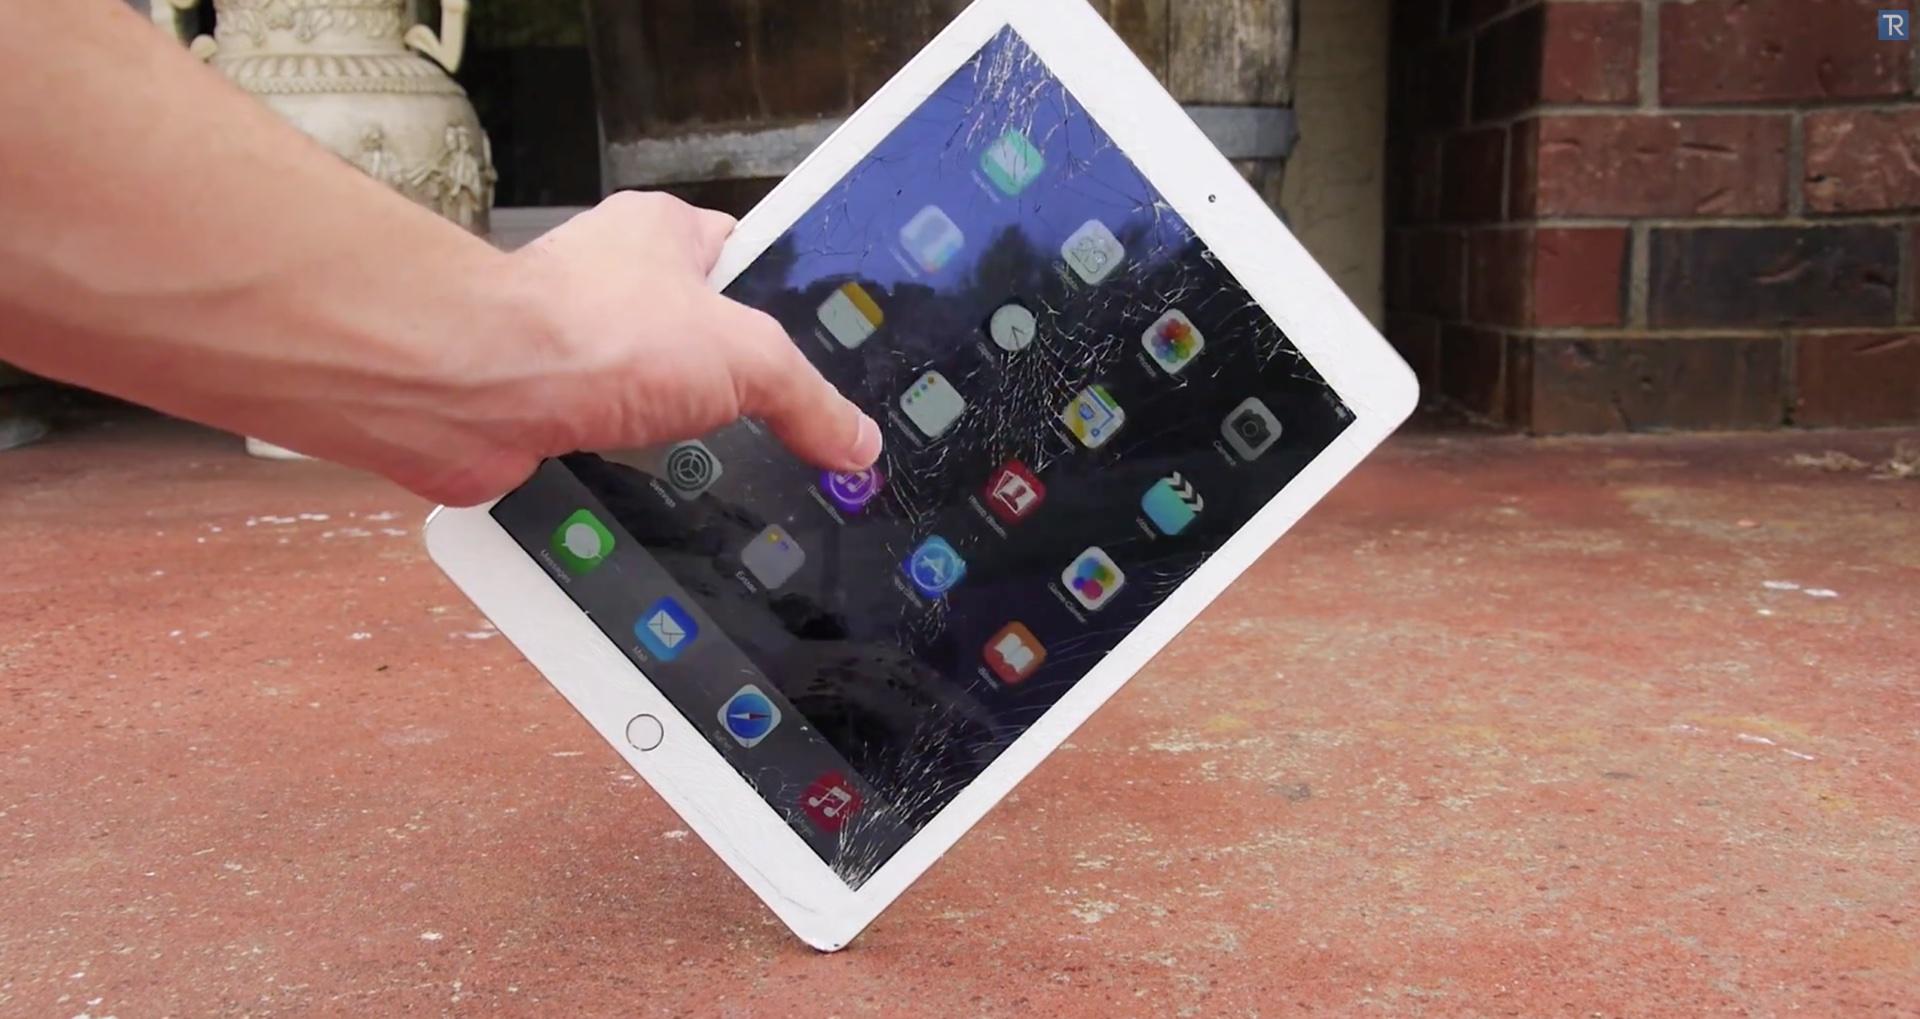 iPad Air 2 drop test 001